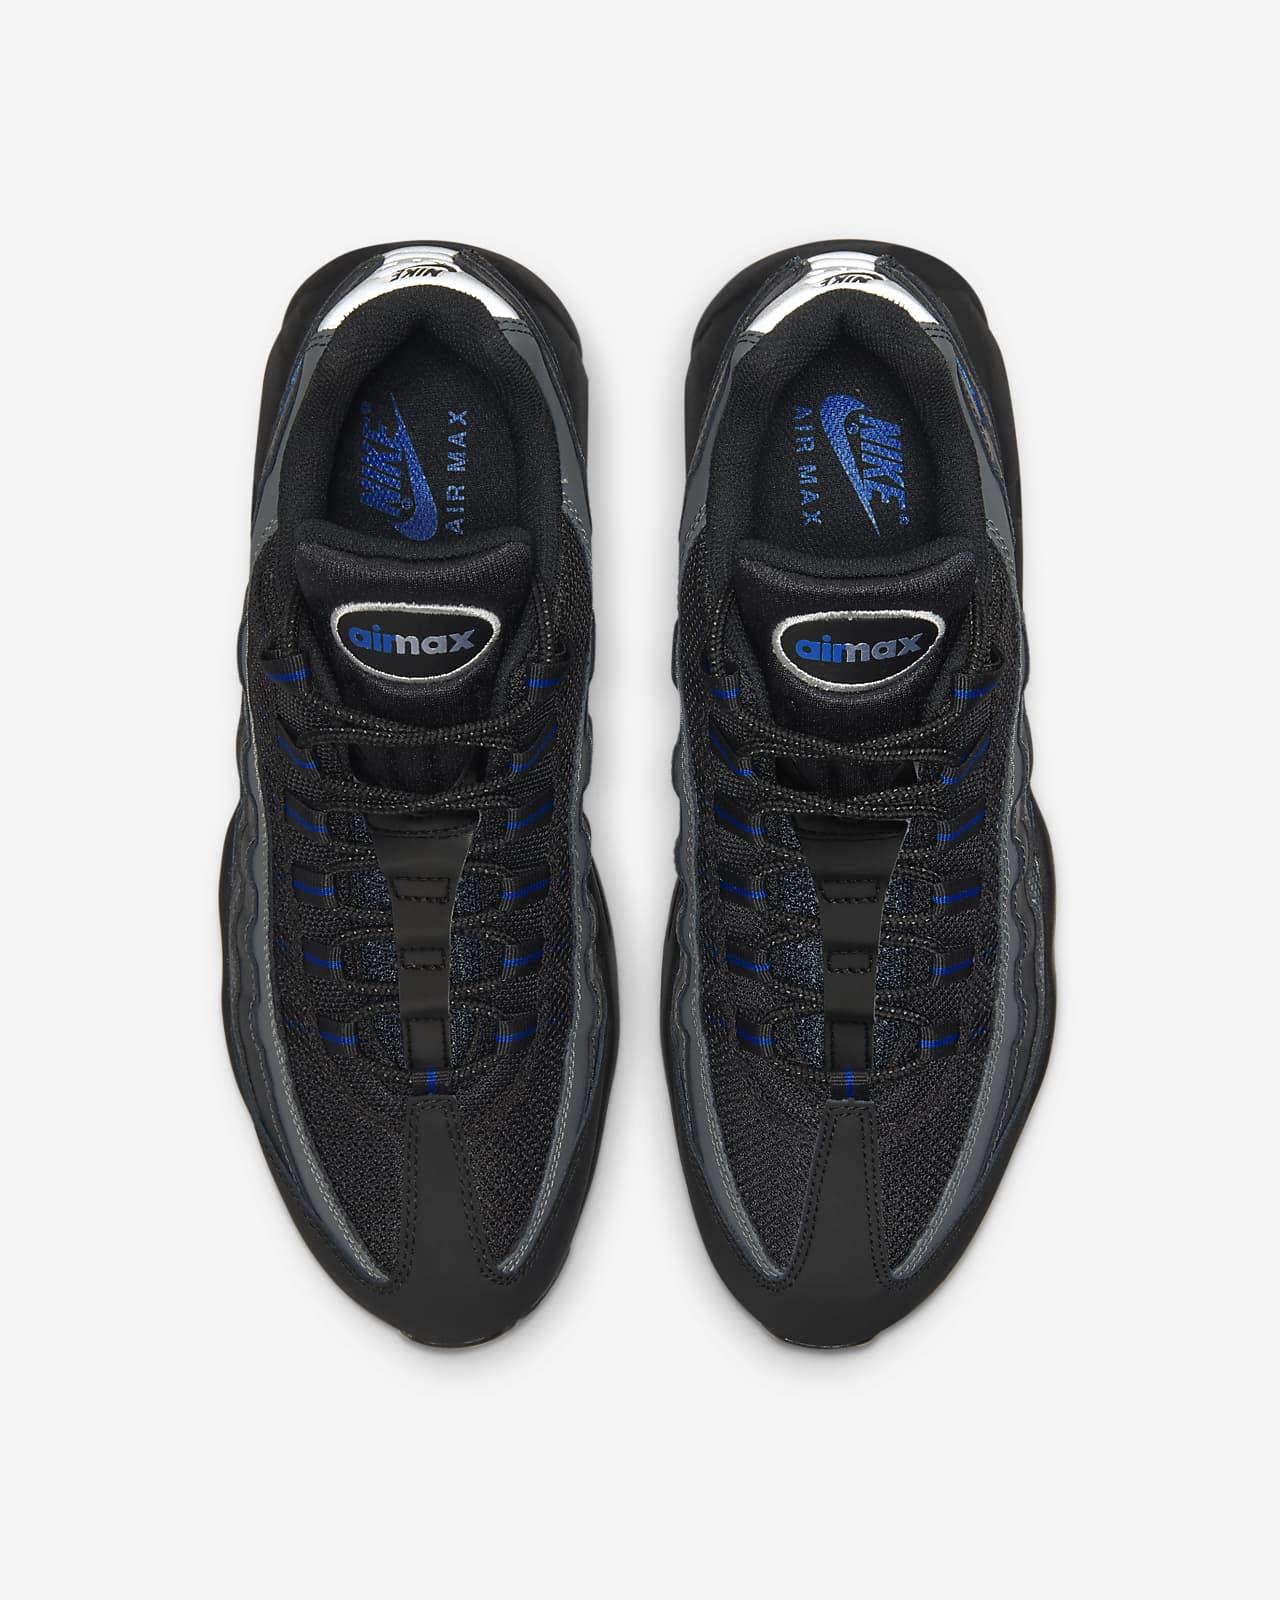 Nike Air Max 95 Essential Men's Shoes. Nike SA